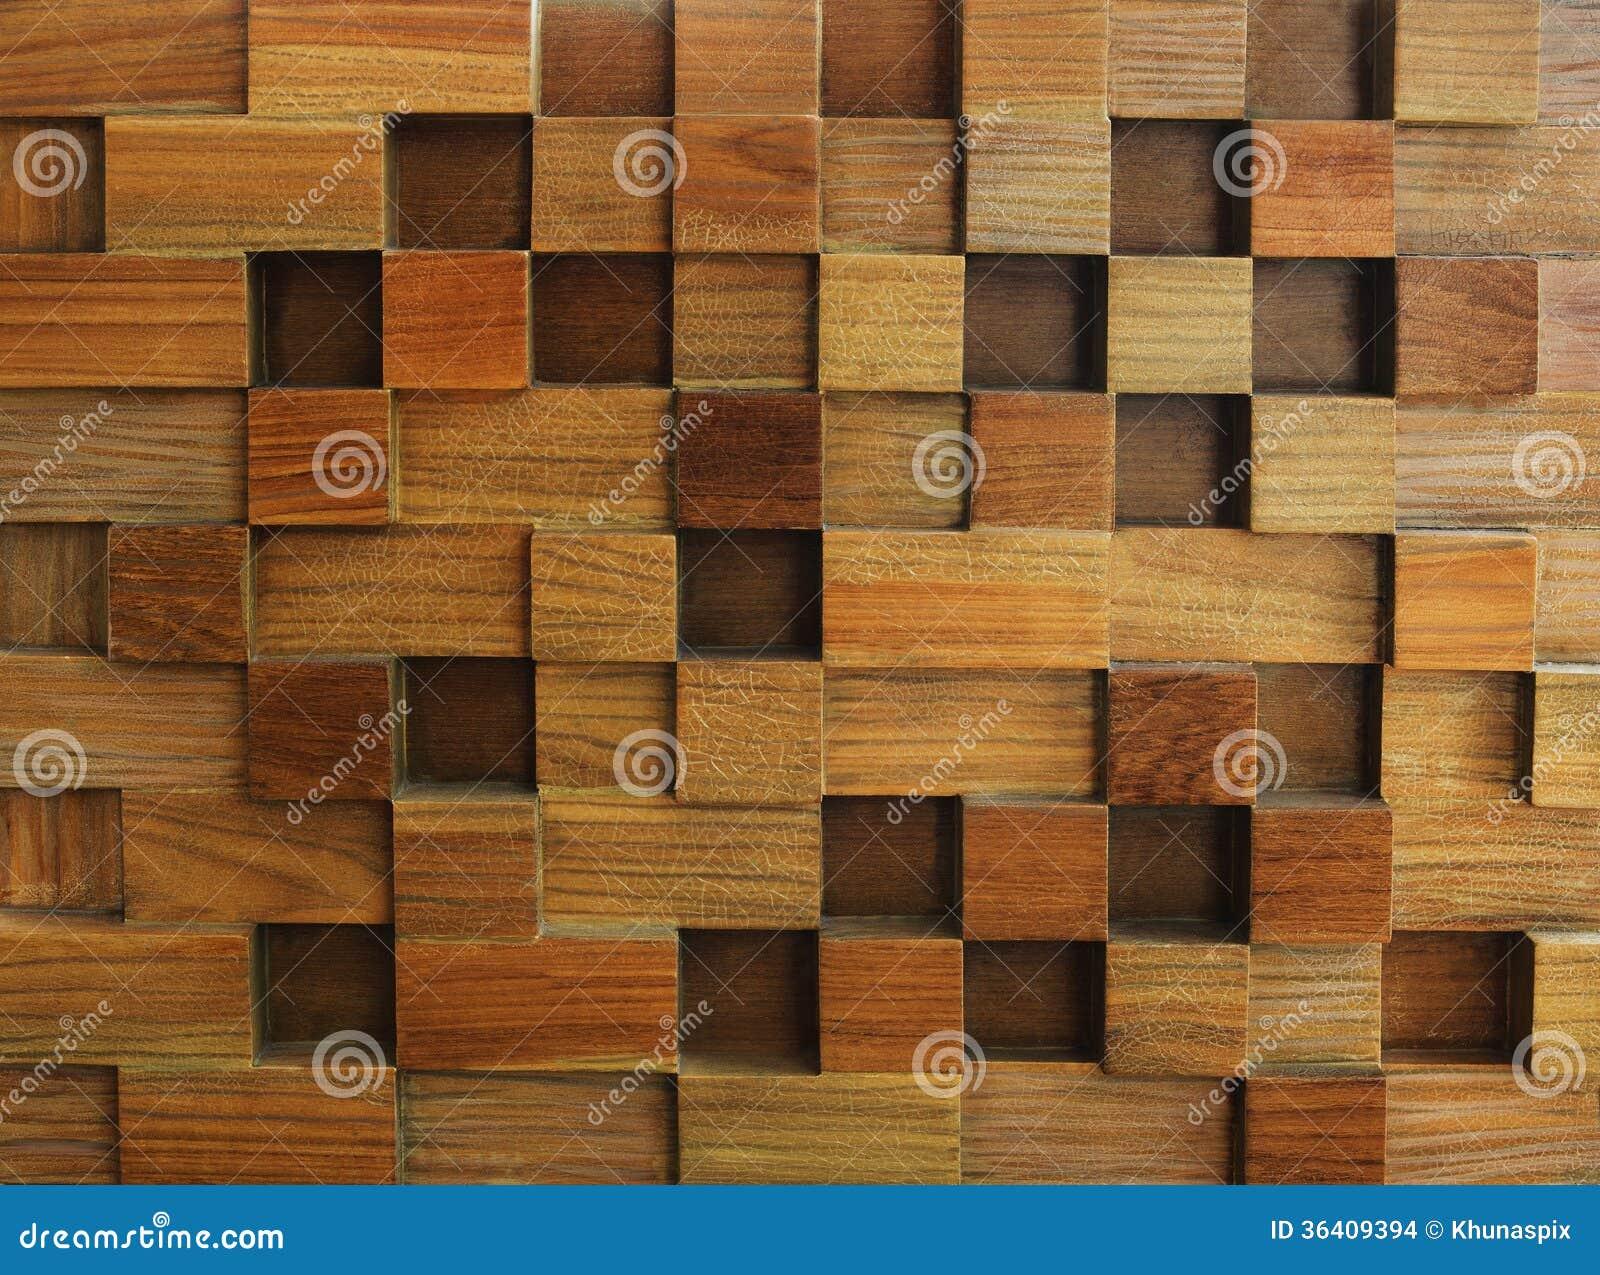 Textured do uso de madeira do fundo do cubo para a forma de múltiplos propósitos e